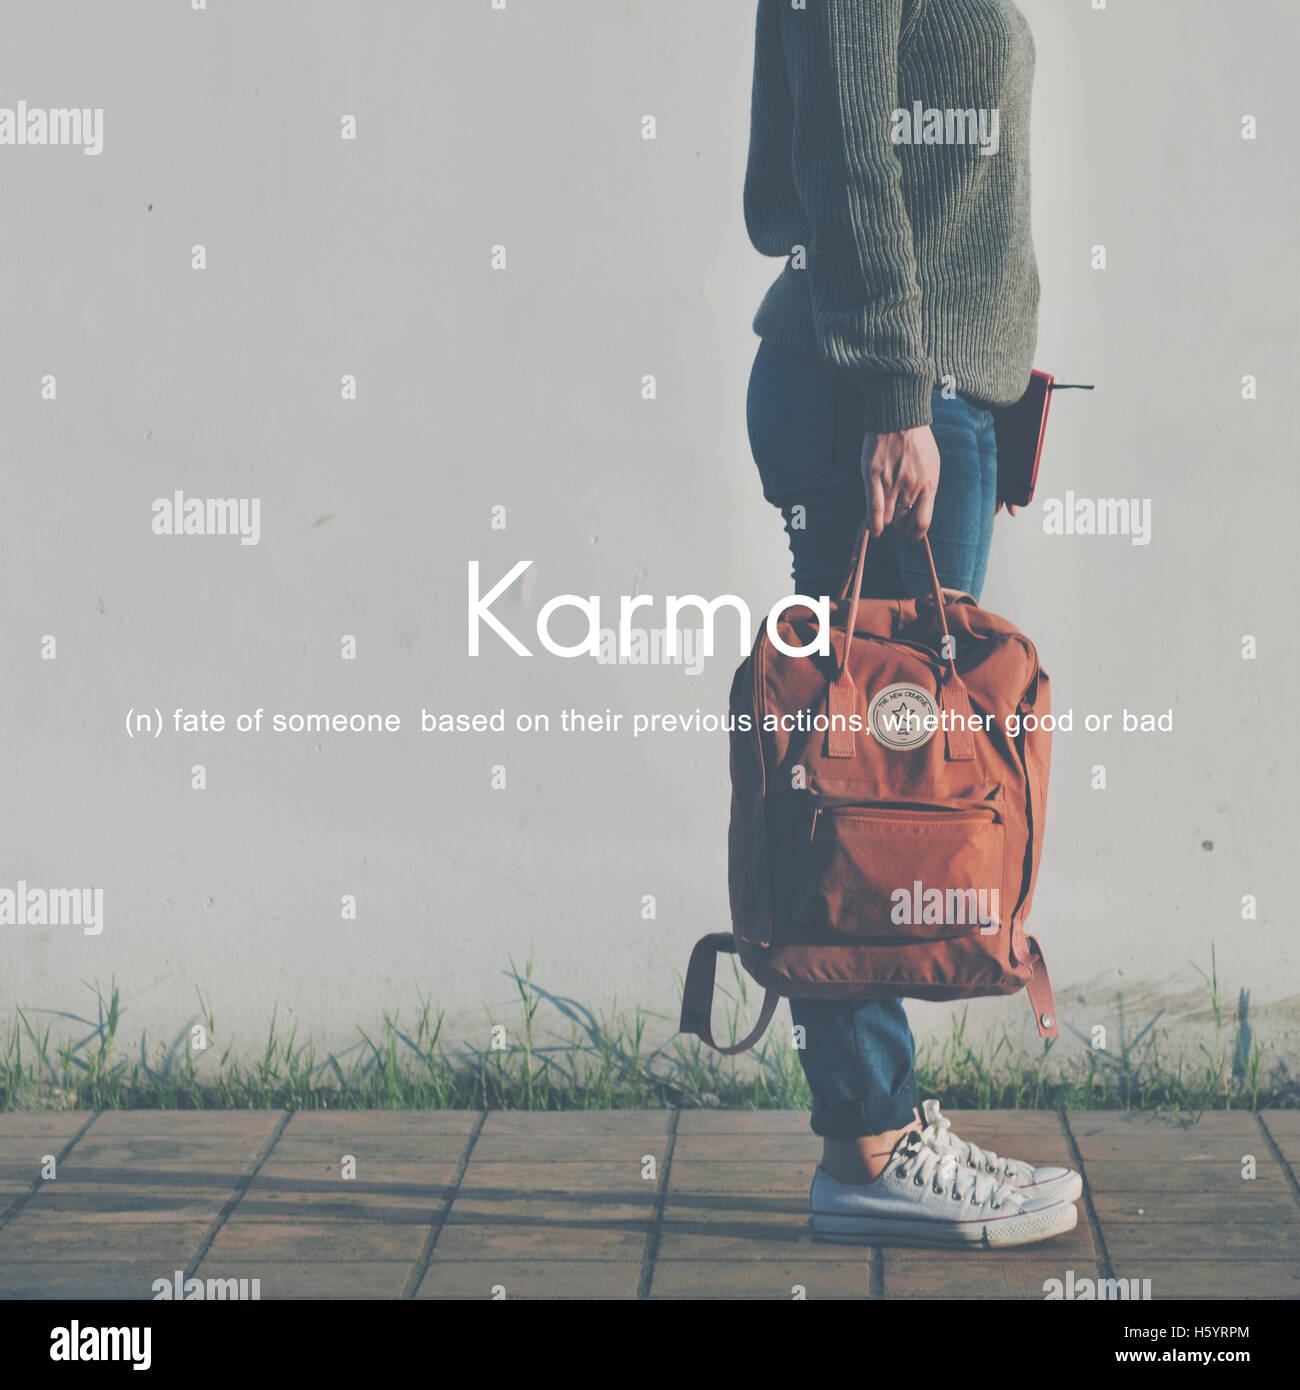 Karma Vorherbestimmung Positive Chance Konzept Stockfoto